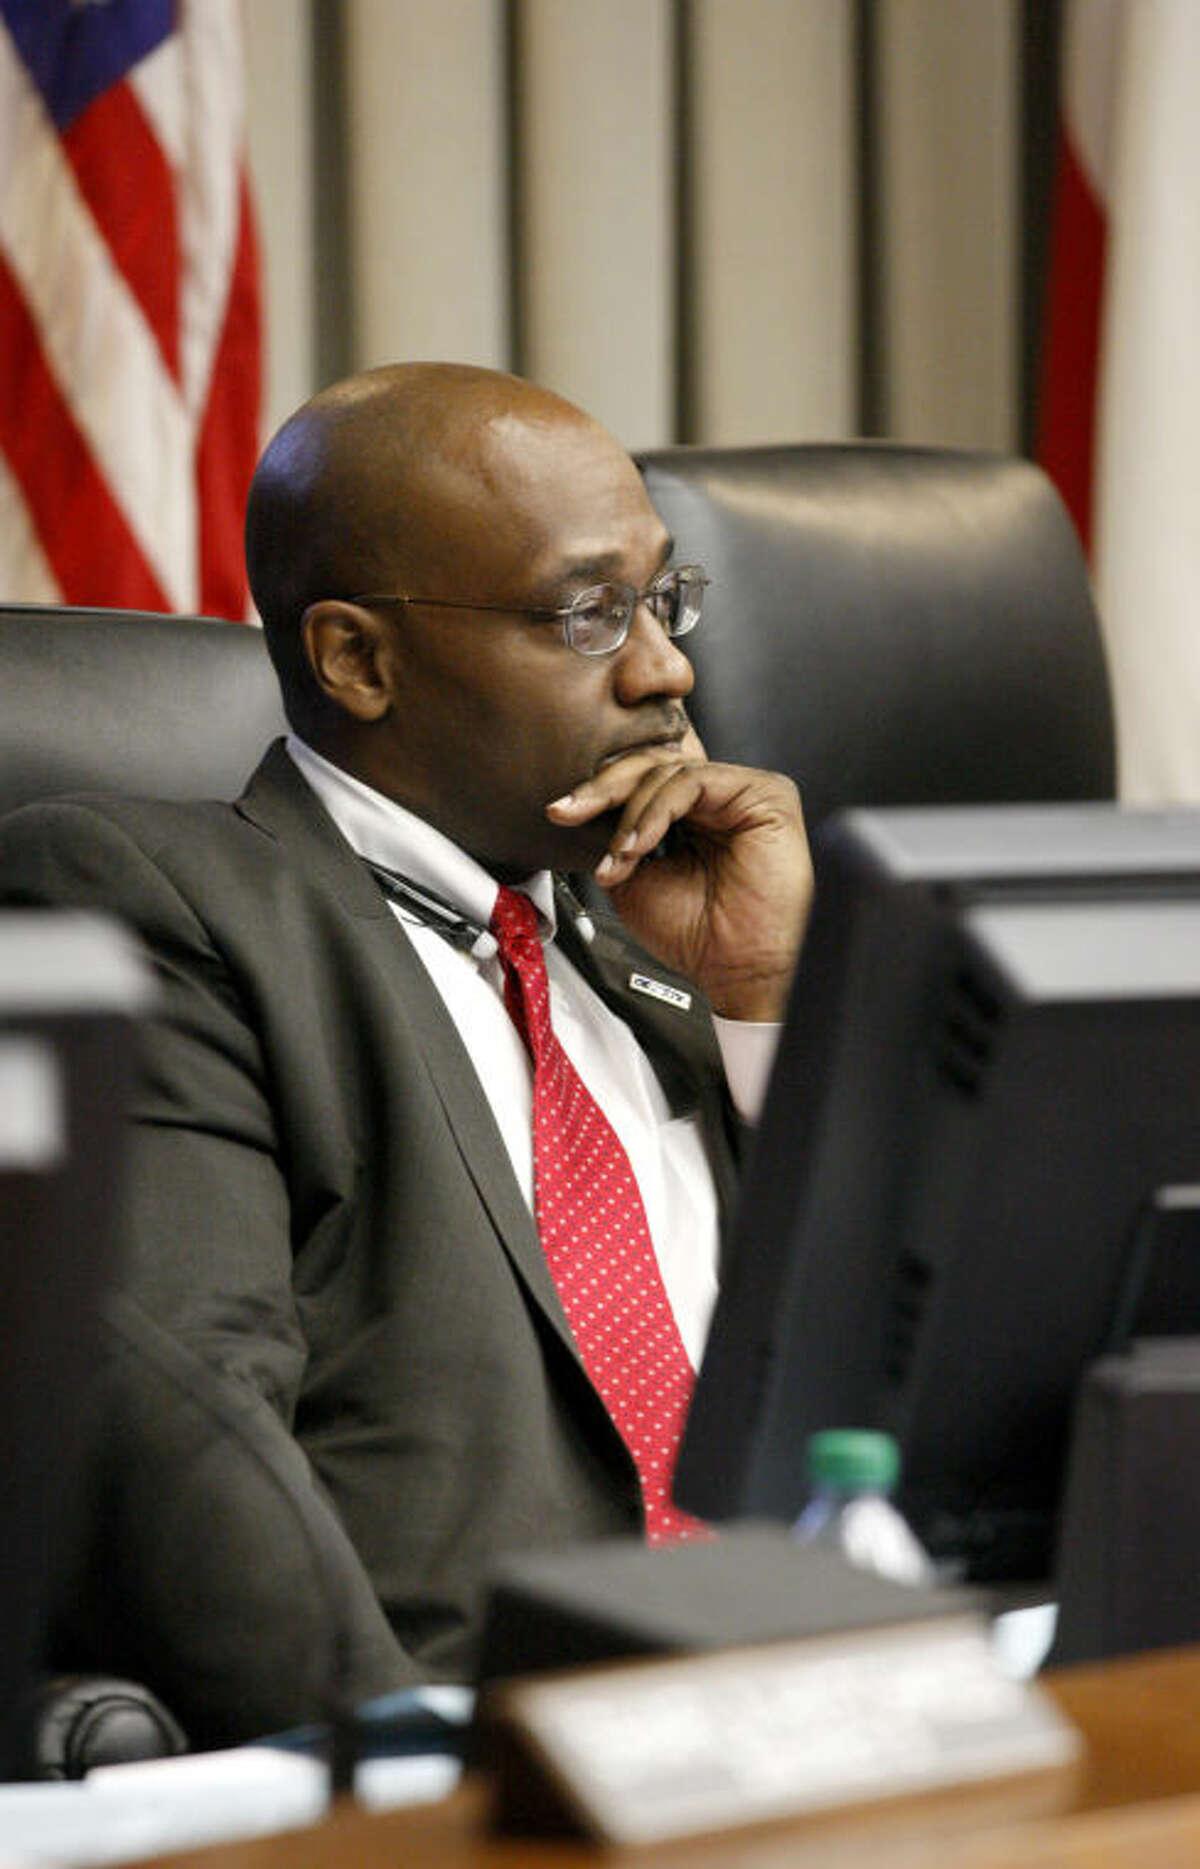 Midland City Councilman John B. Love III appears to be planning a run for U.S. Senate.